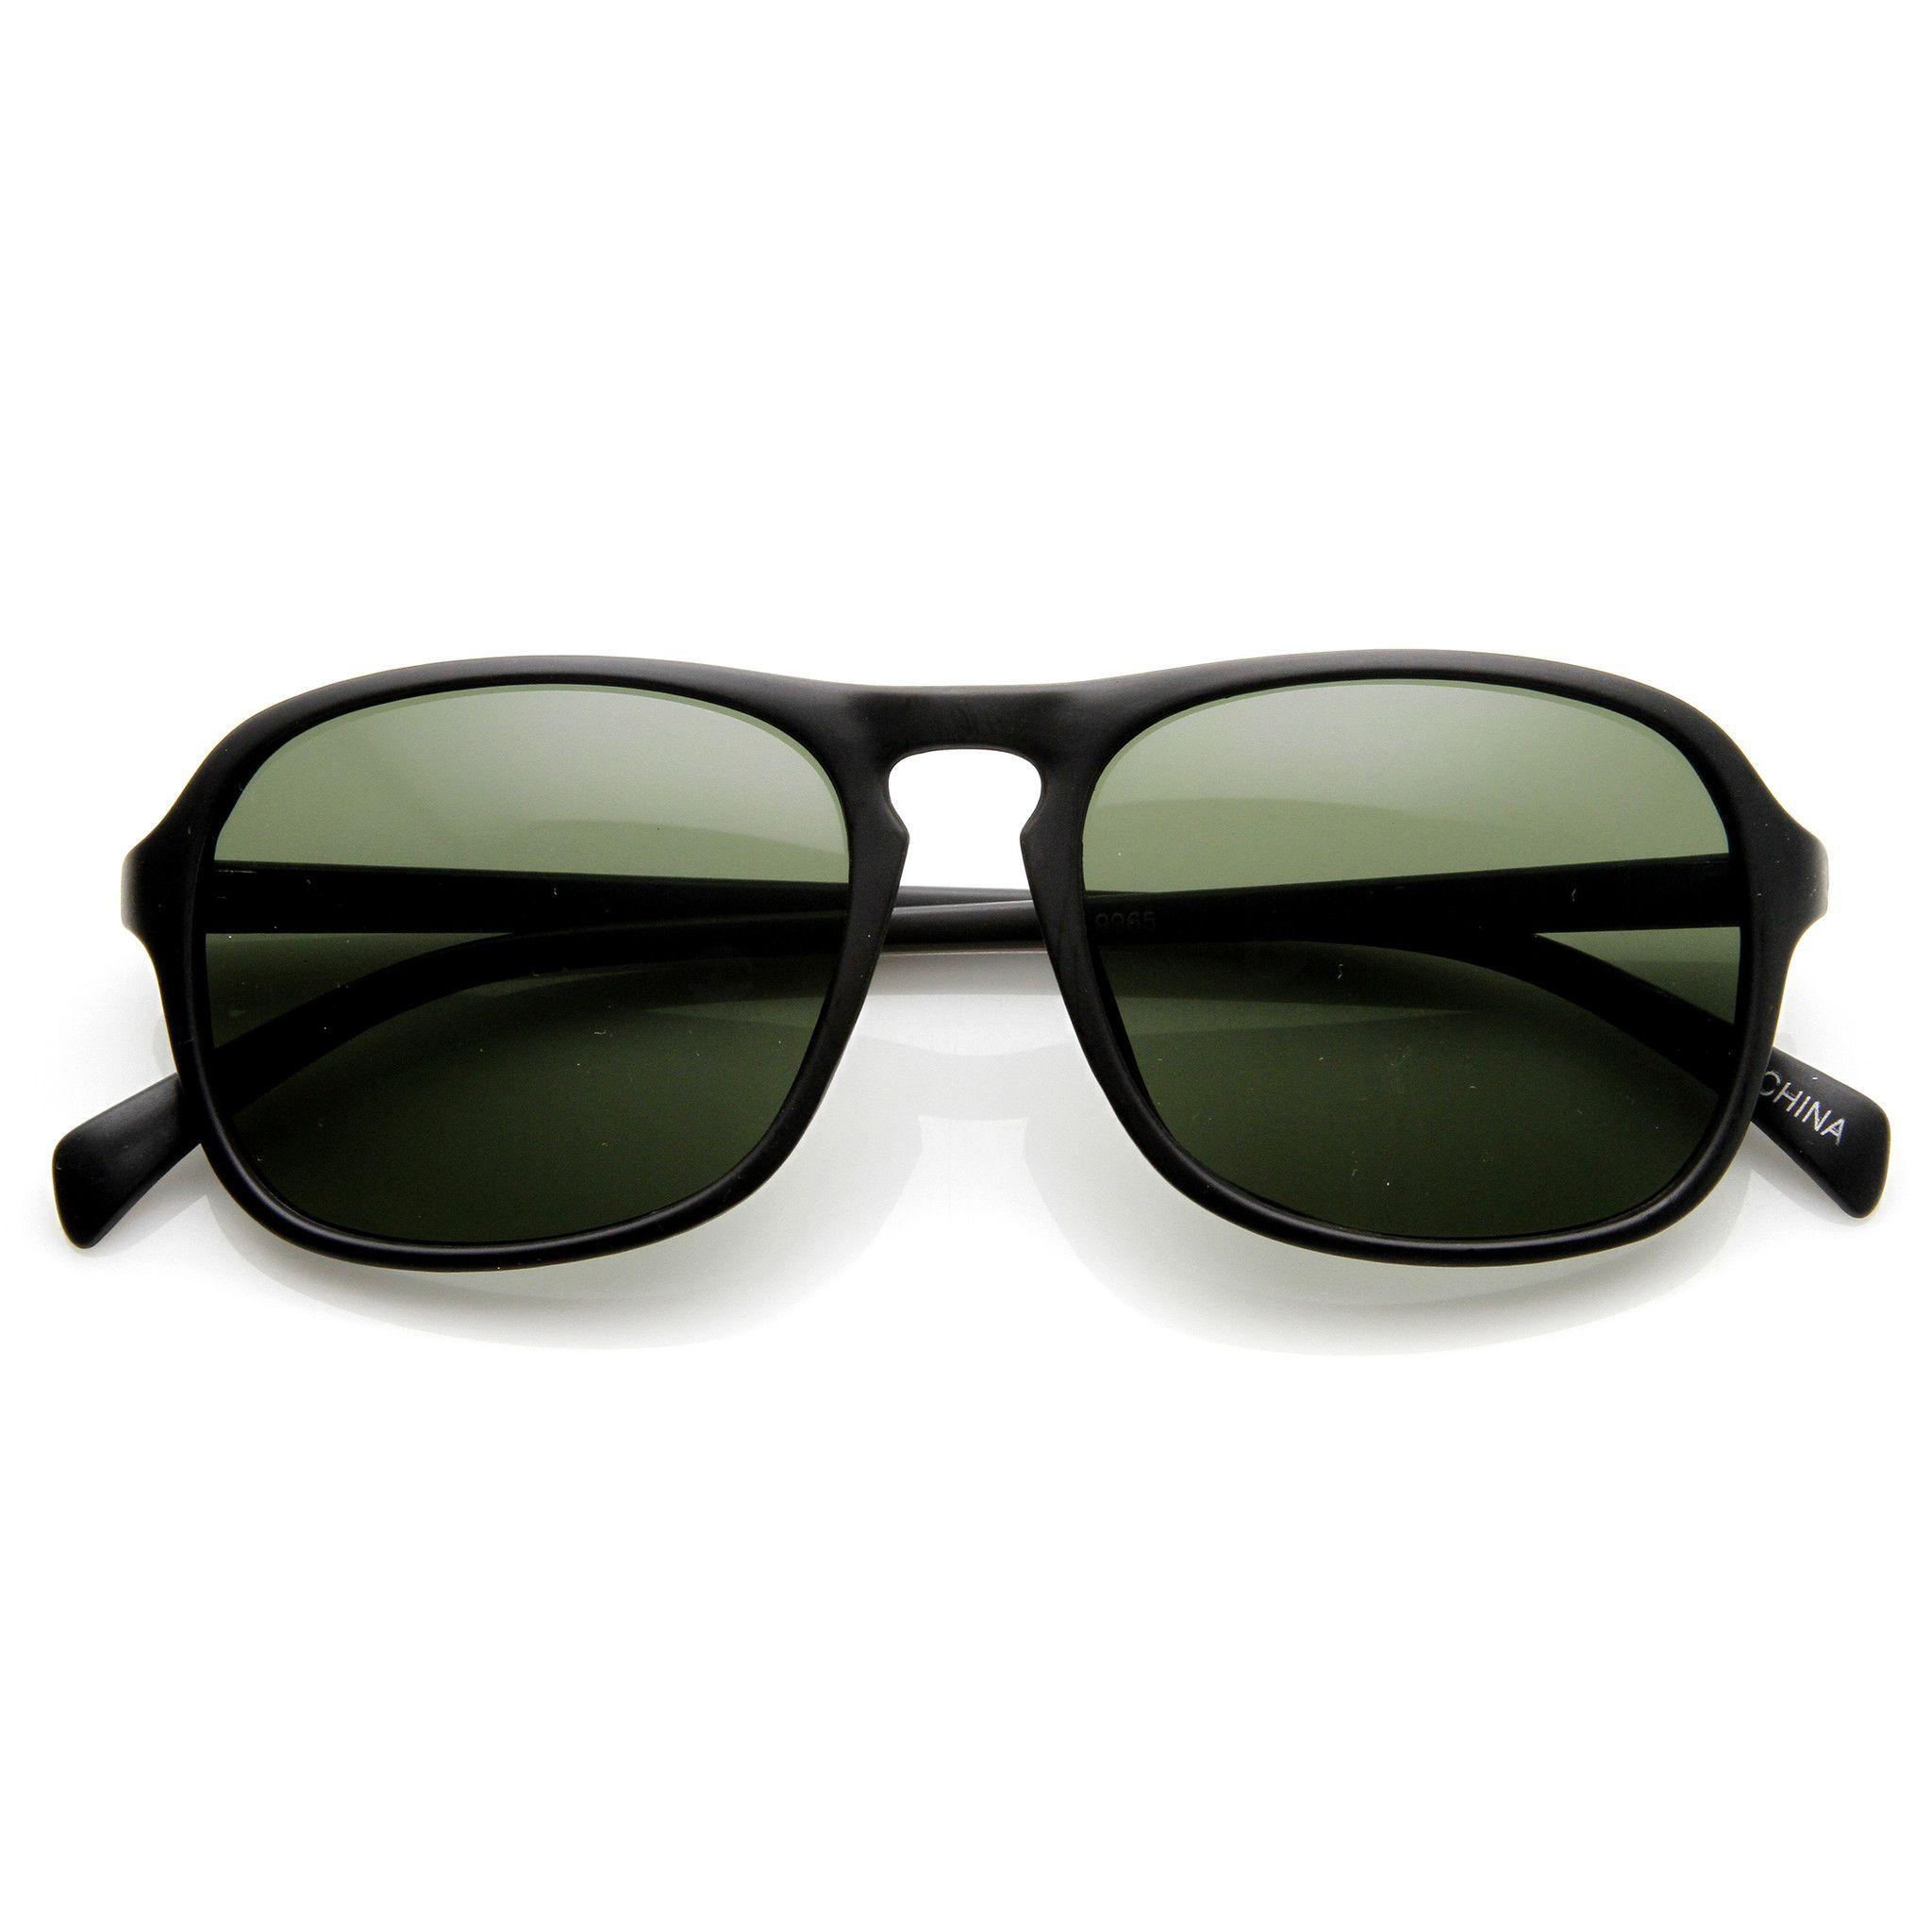 Mens Retro Fashion Keyhole Square Aviator Sunglasses 9176